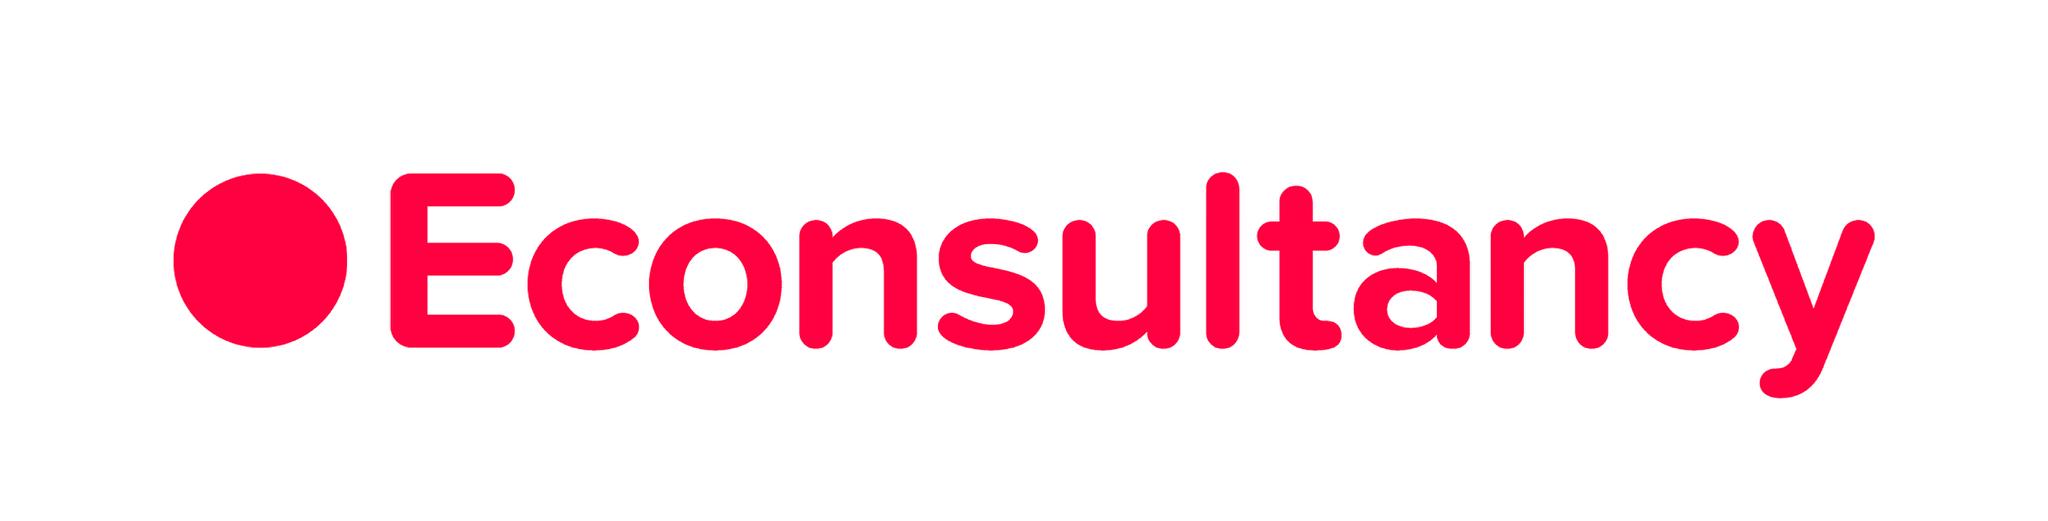 https://www.epsilon.com/hubfs/EMEA%20EPSILON/rc-news-logos/Econsultancy_Secondary_RGB.JPG.png